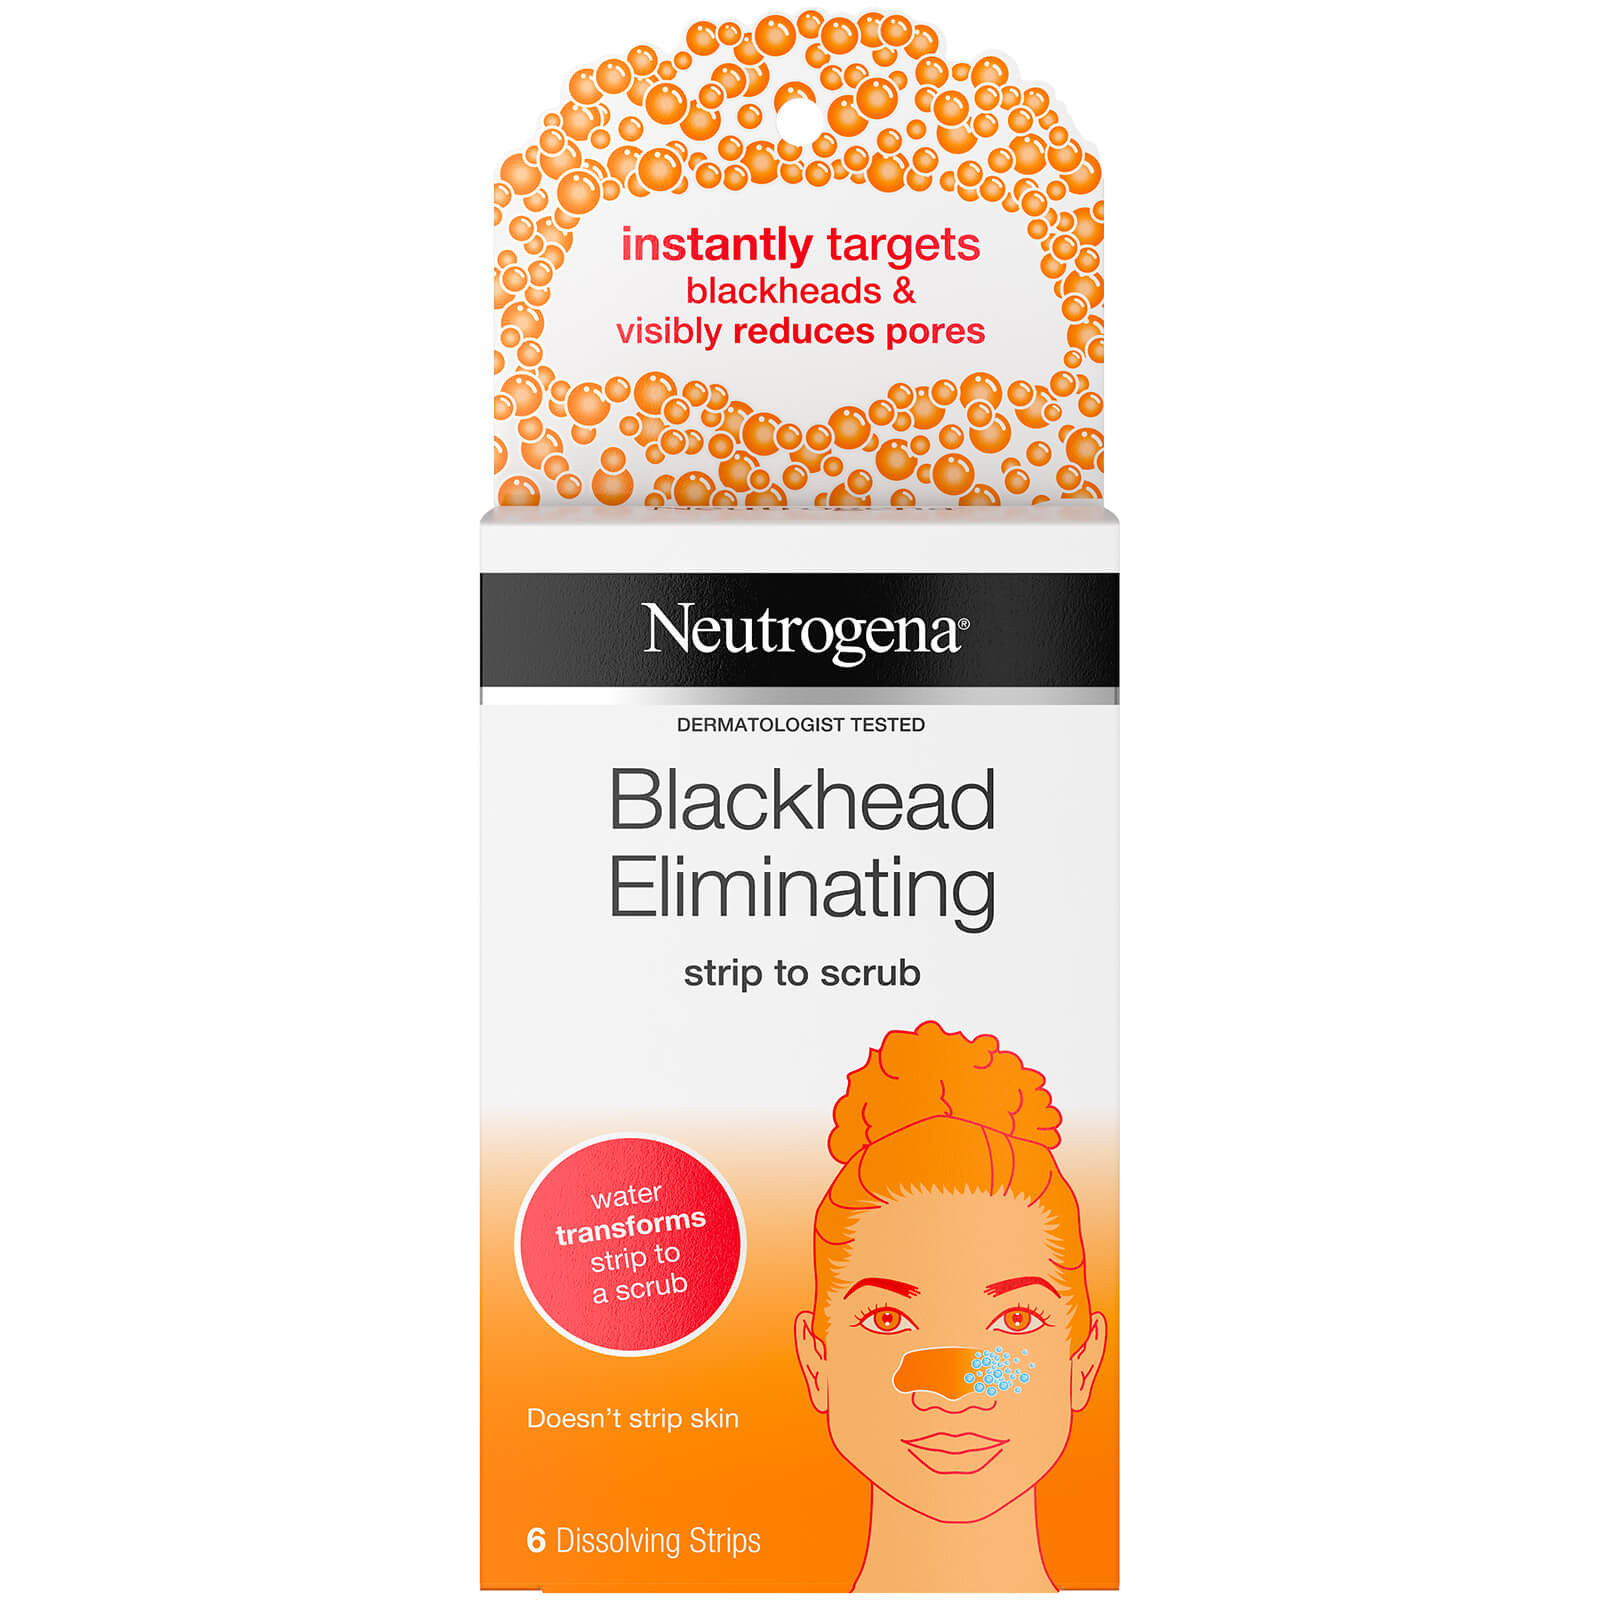 Neutrogena Blackhead Strips (6)